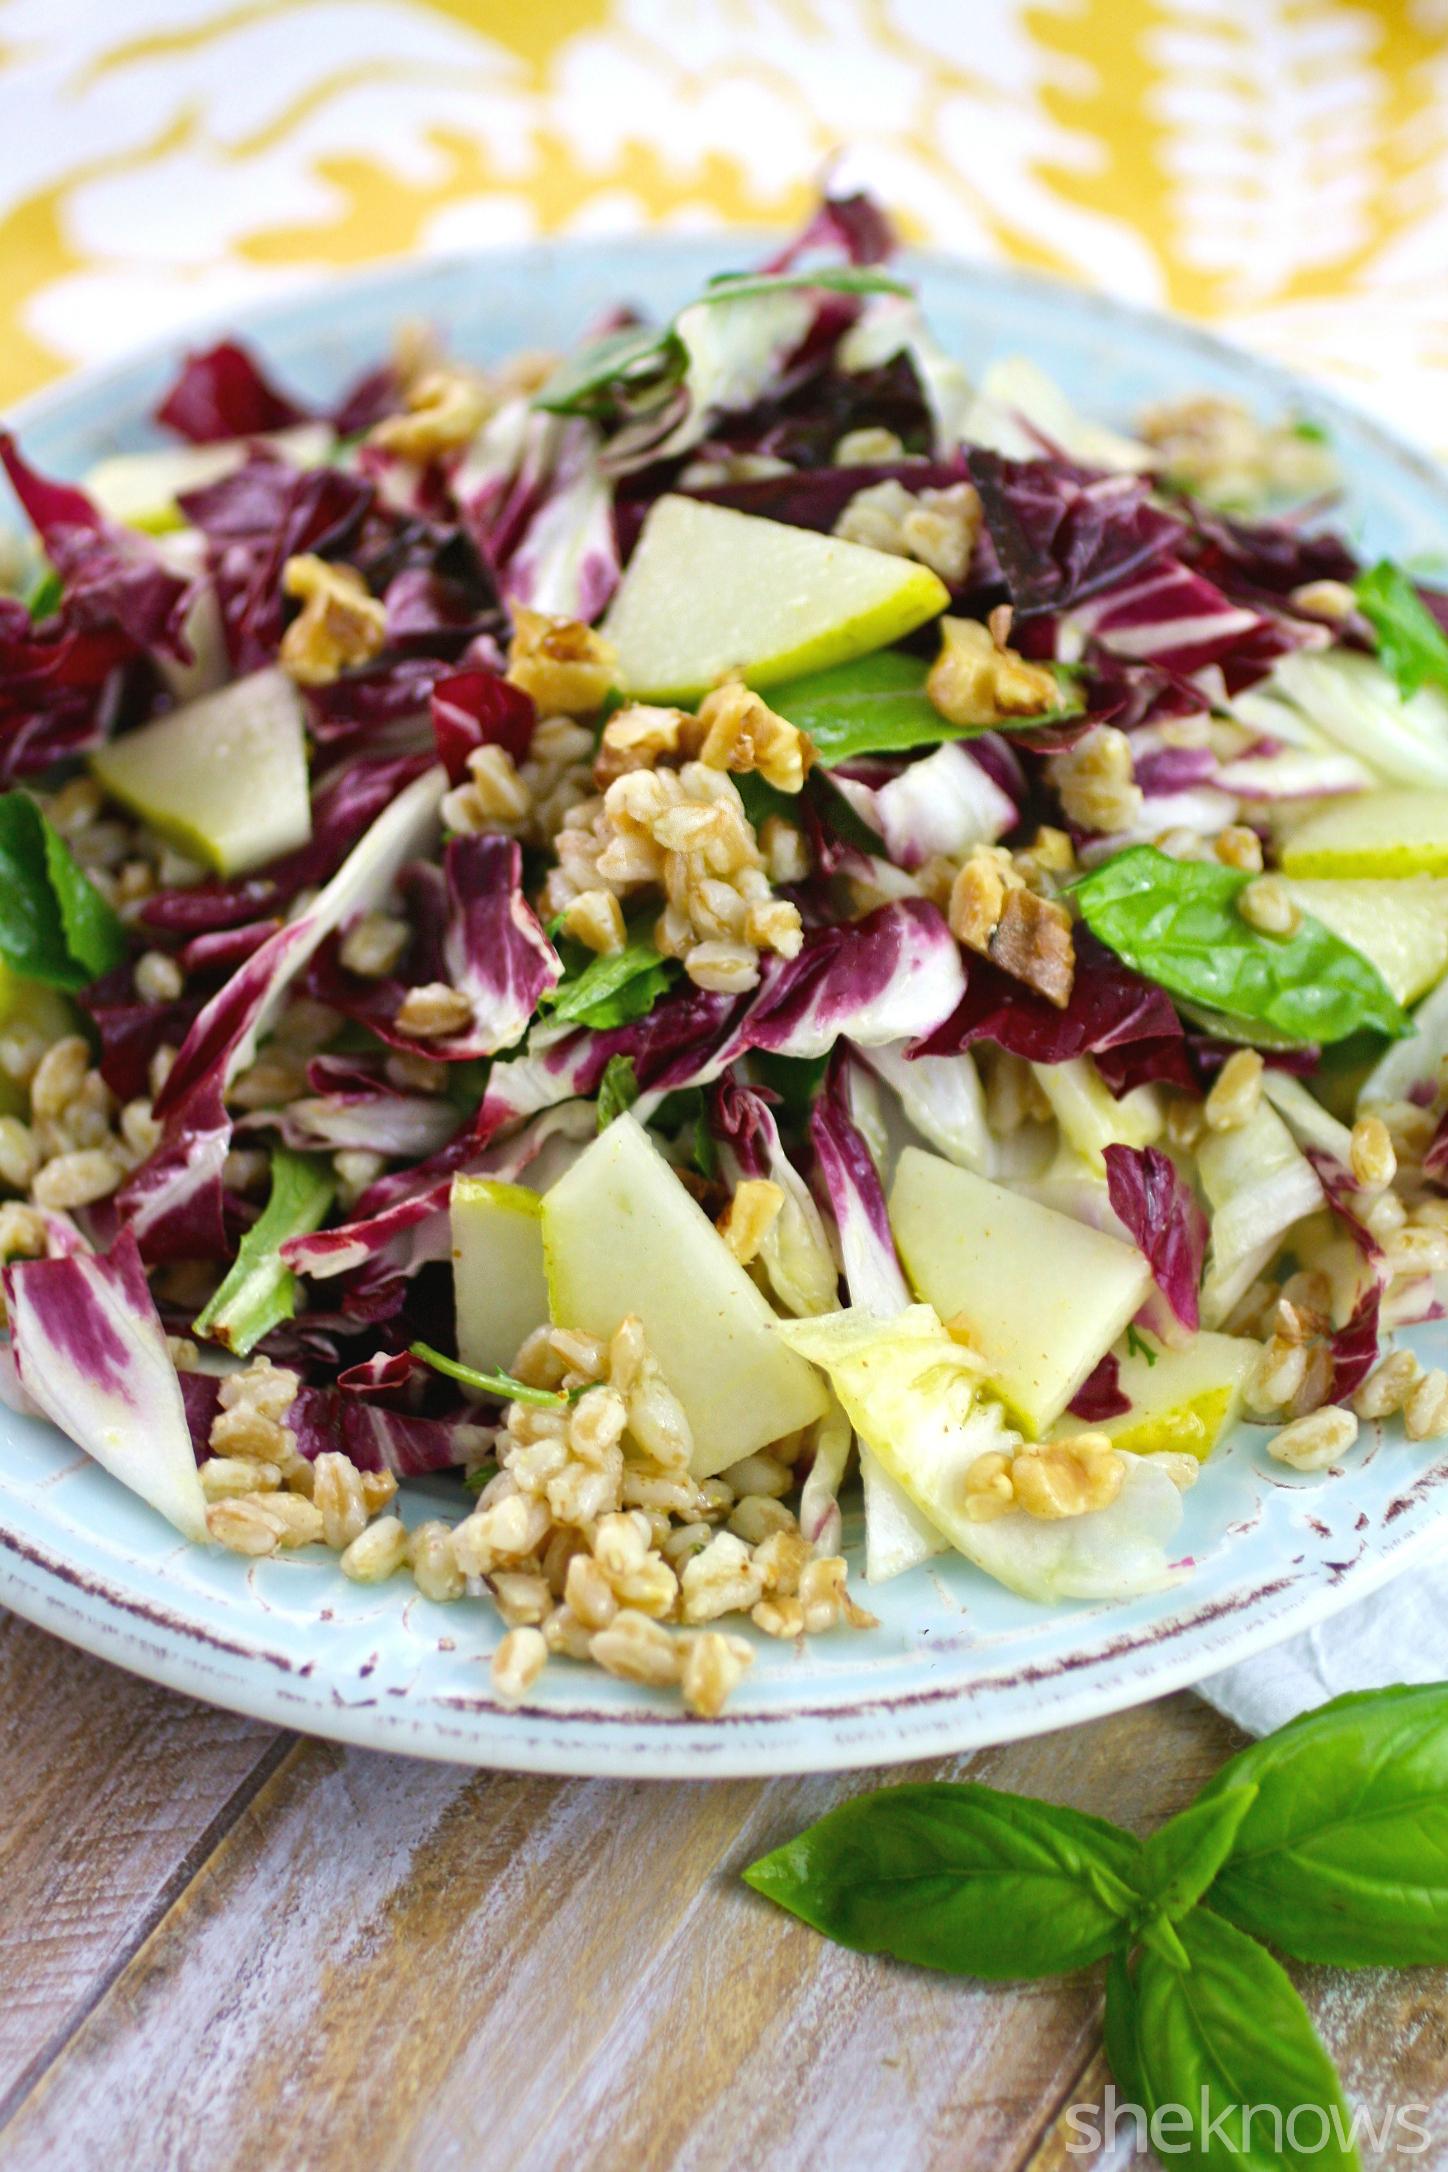 Focus on a farro, radicchio, and pear salad with lemon-basil vinaigrette